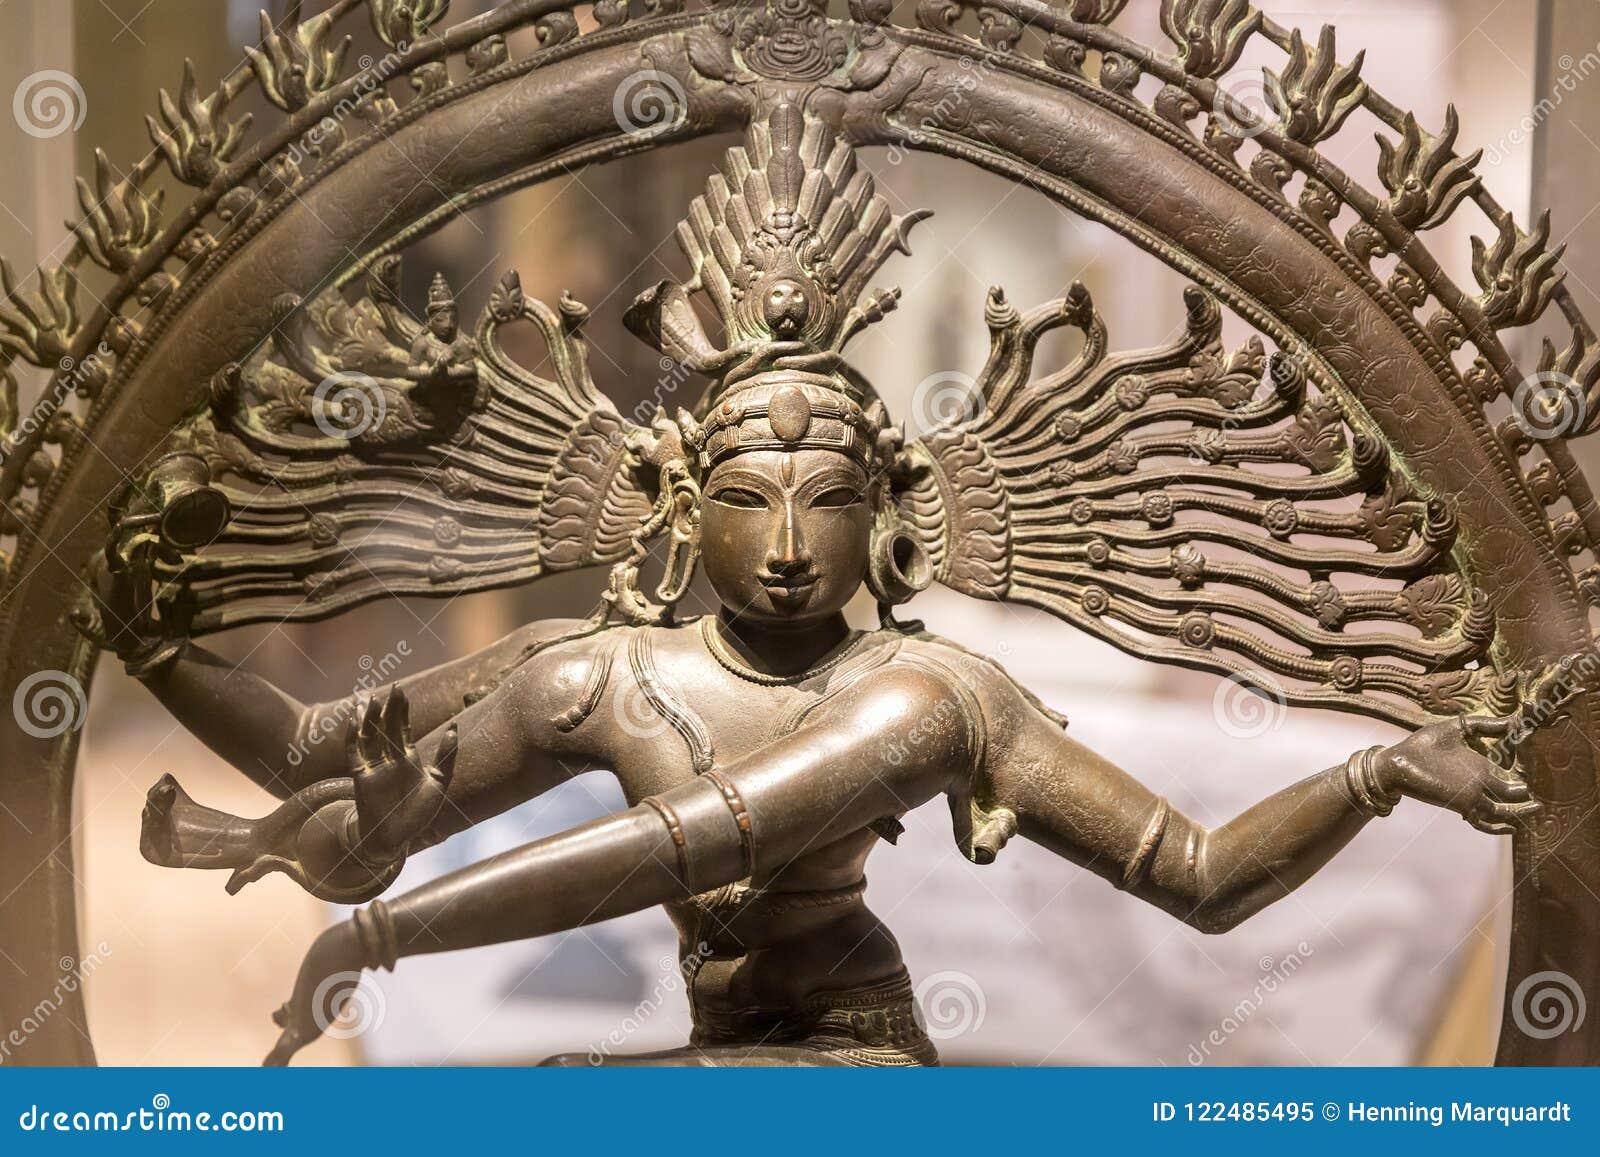 Sculpture of Nataraja, Lord of the Dance, New Delhi, India